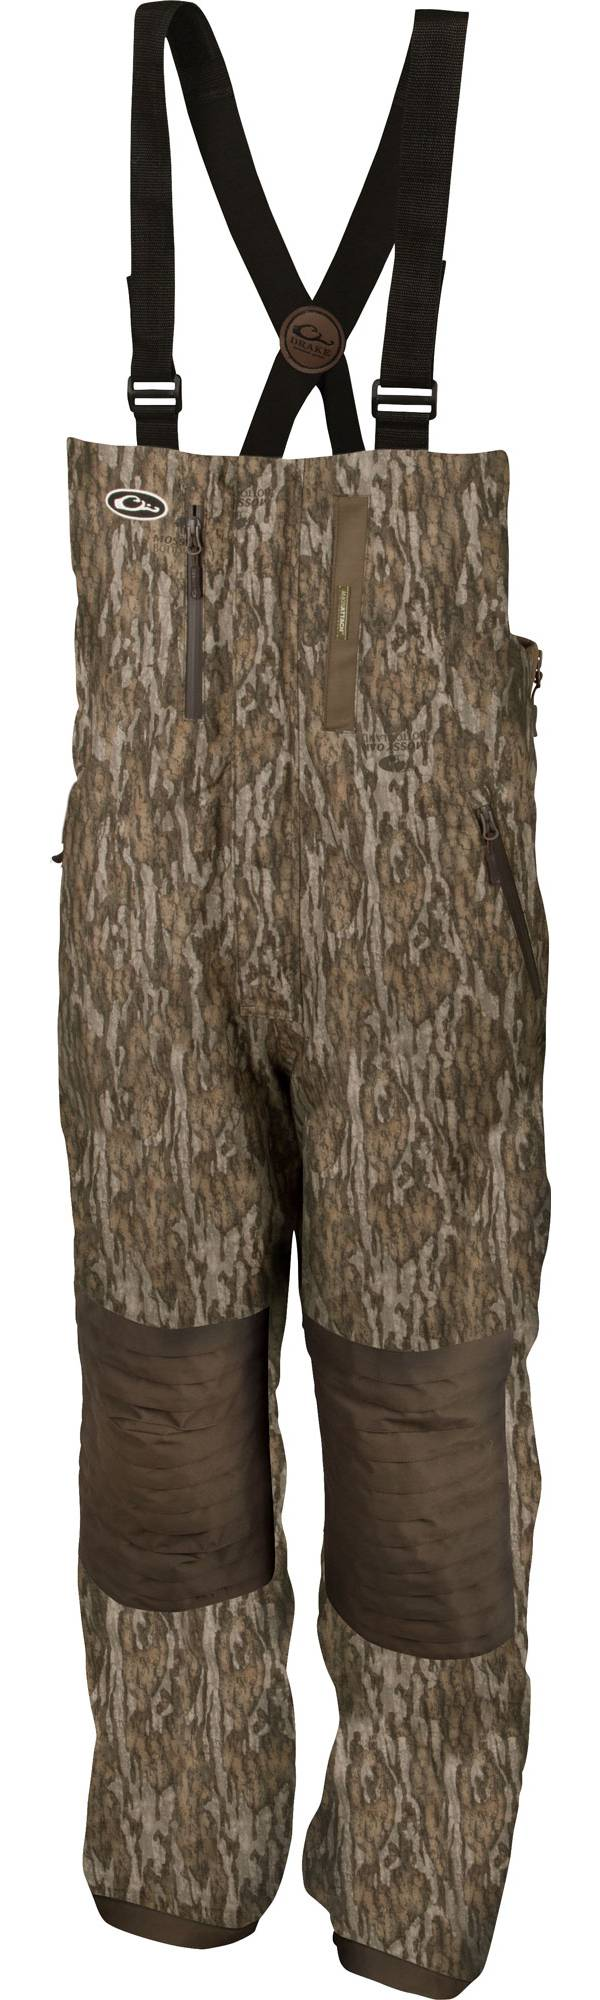 Drake Waterfowl Men's Guardian Flex Insulated Hunting Bib product image